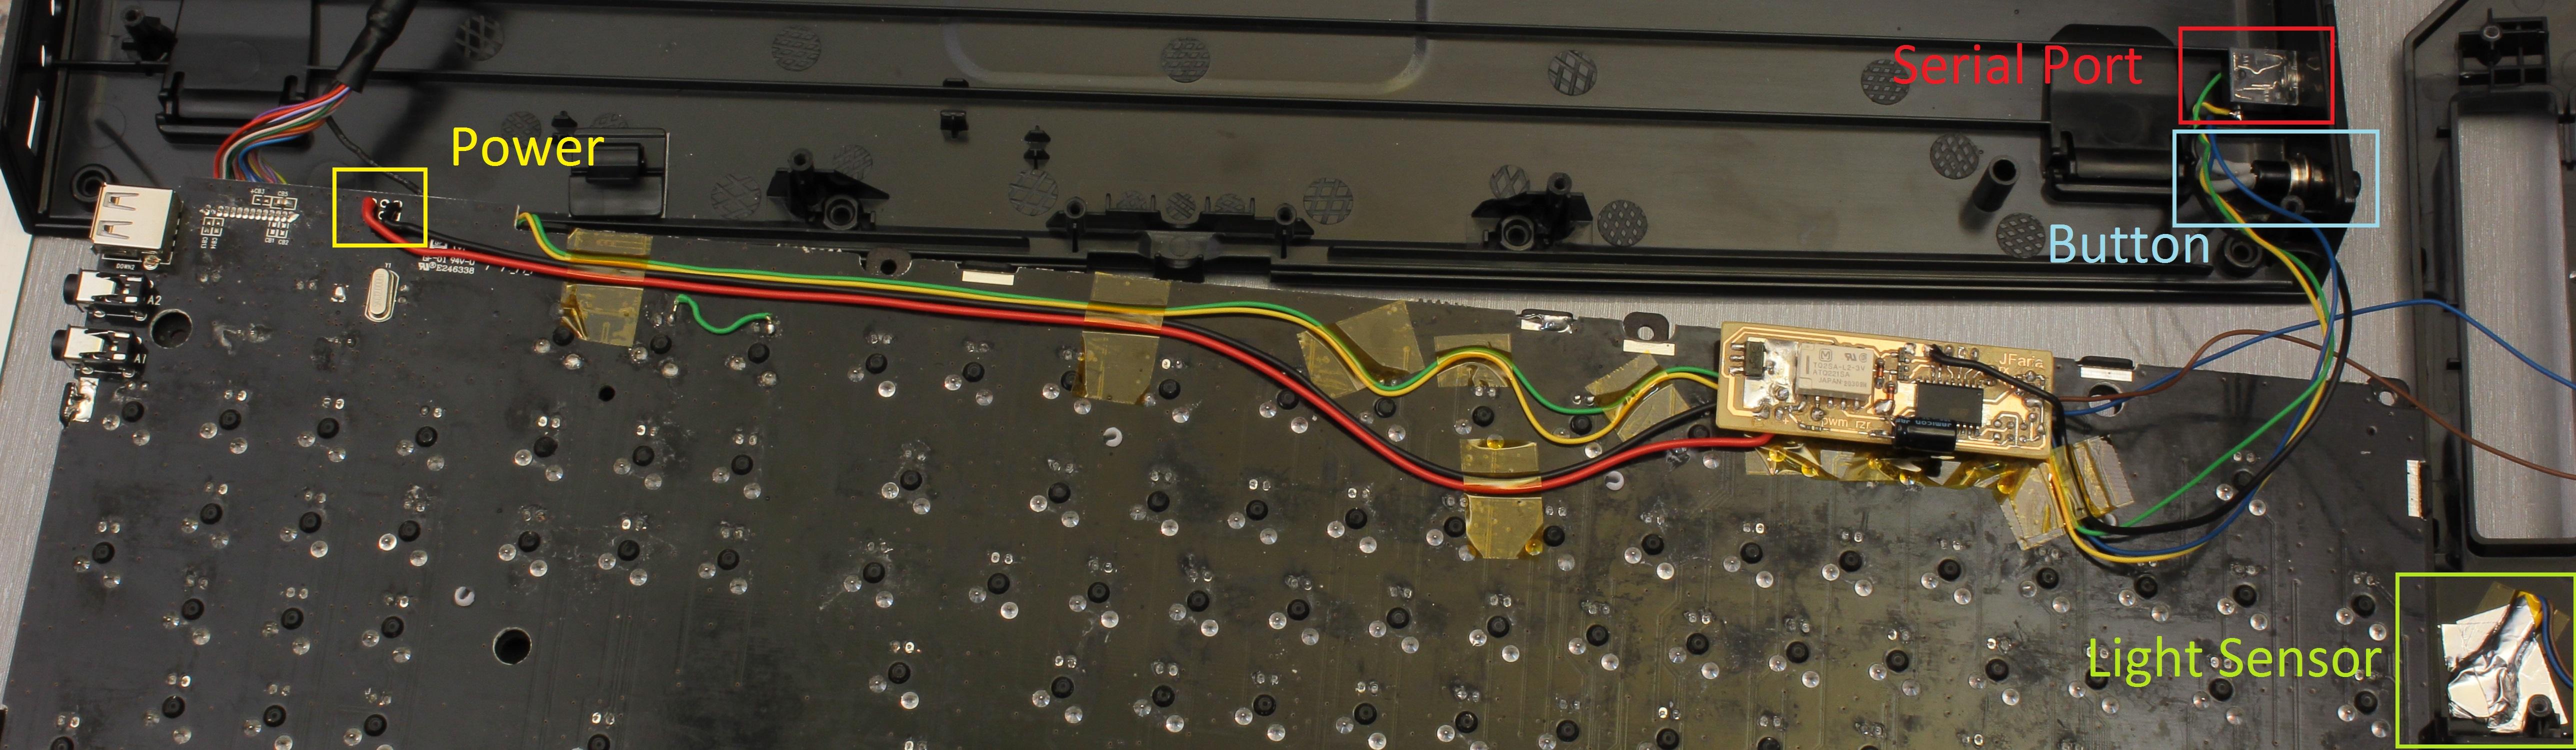 Razer Lycosa Keyboard Usb Plug Wiring Diagram Libraries Receptacle Best Books Resourcesrazer